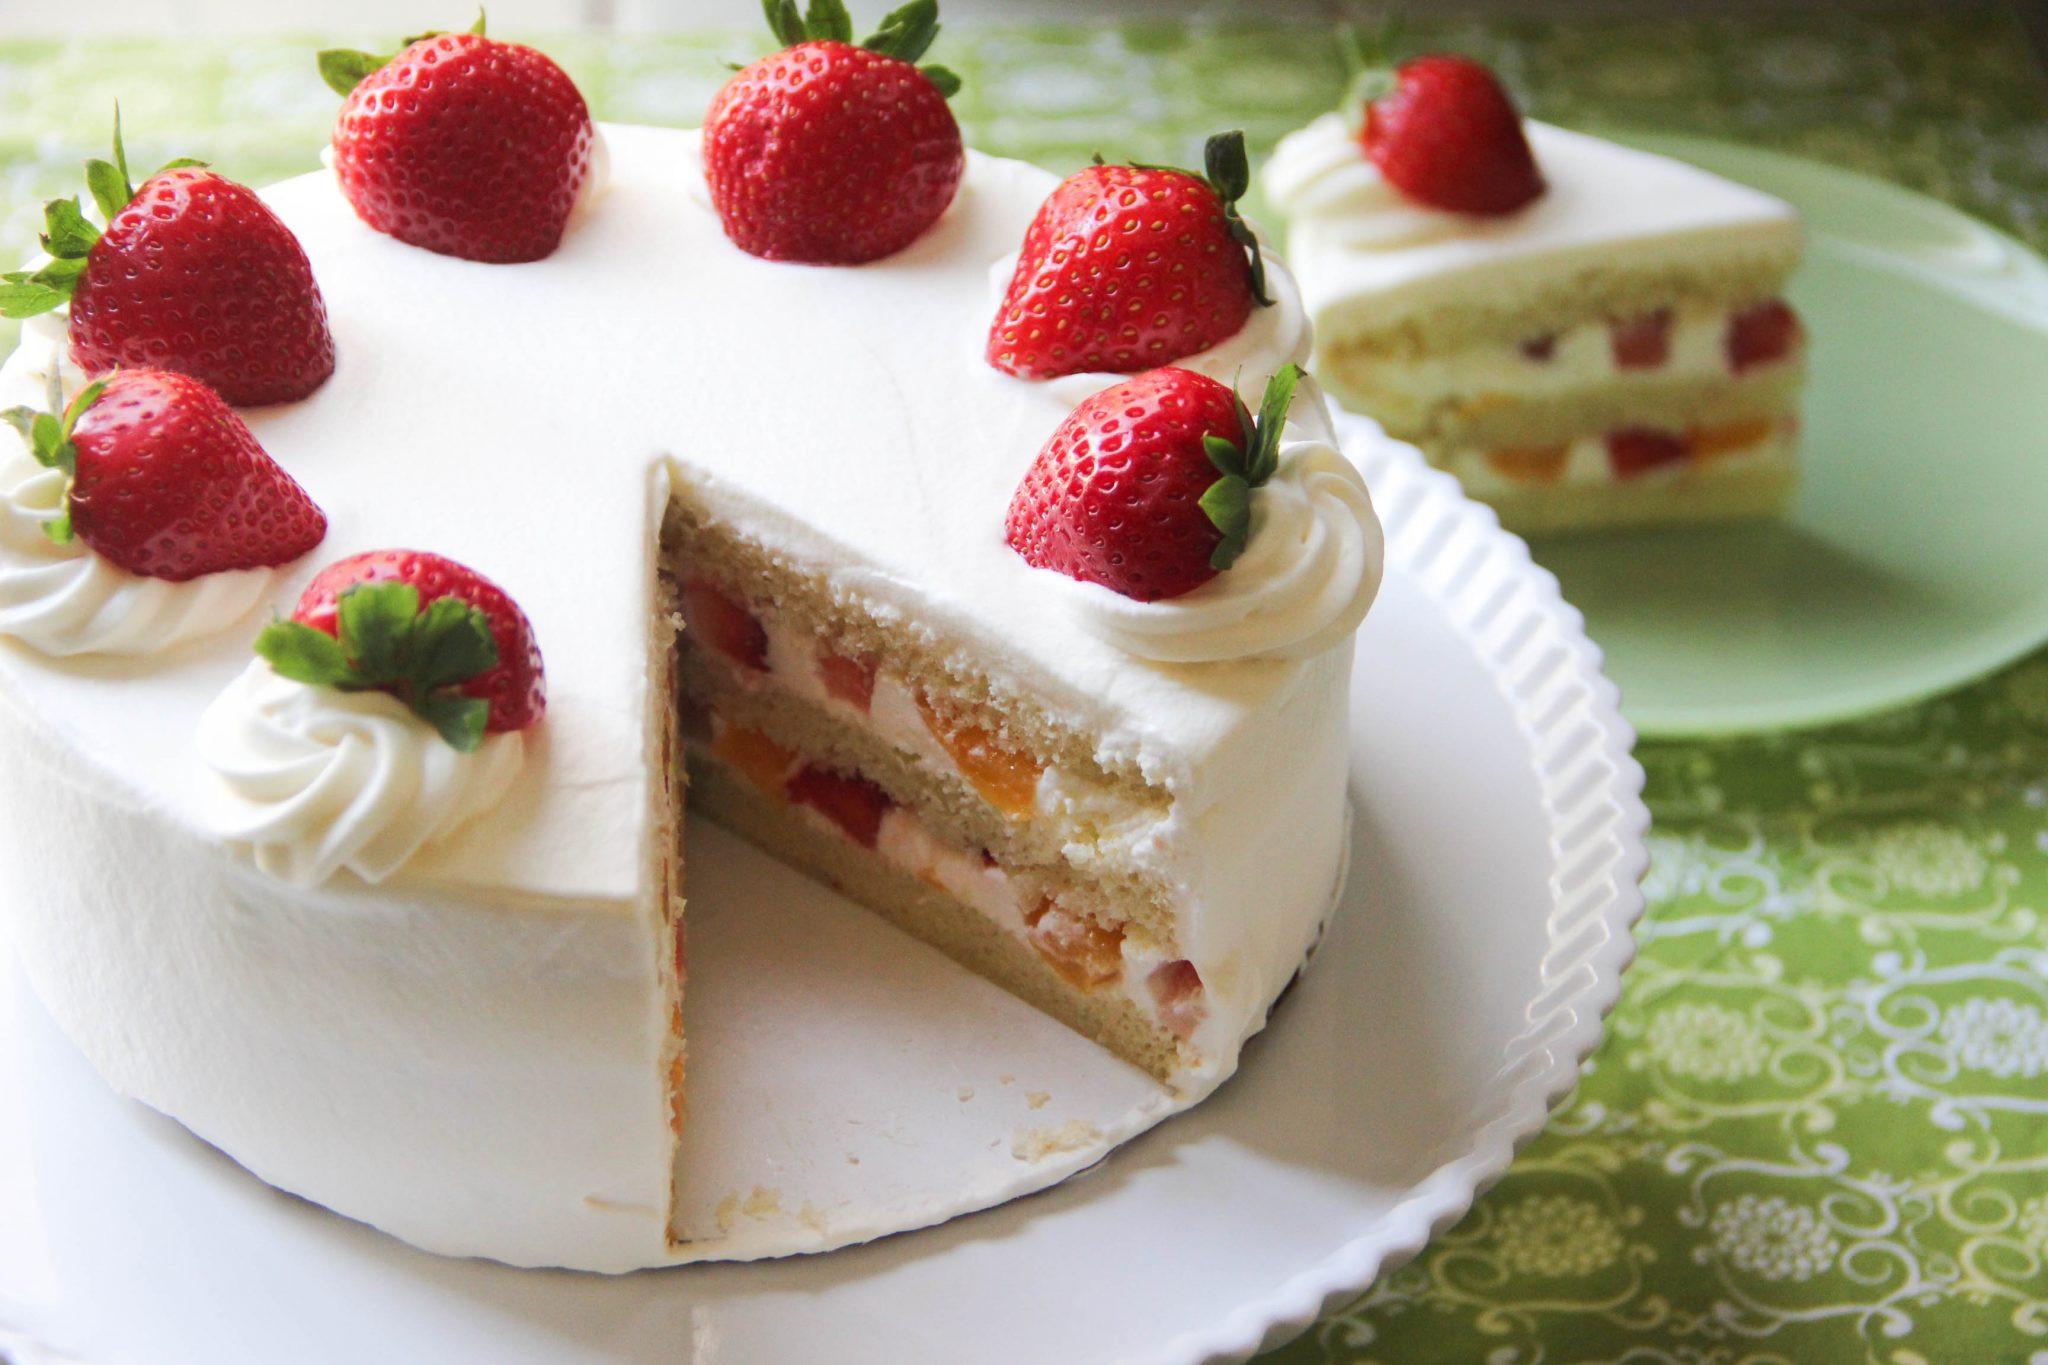 Strawberry Shortcake Dessert Recipes  Strawberry Shortcake Recipe – Japanese Cooking 101